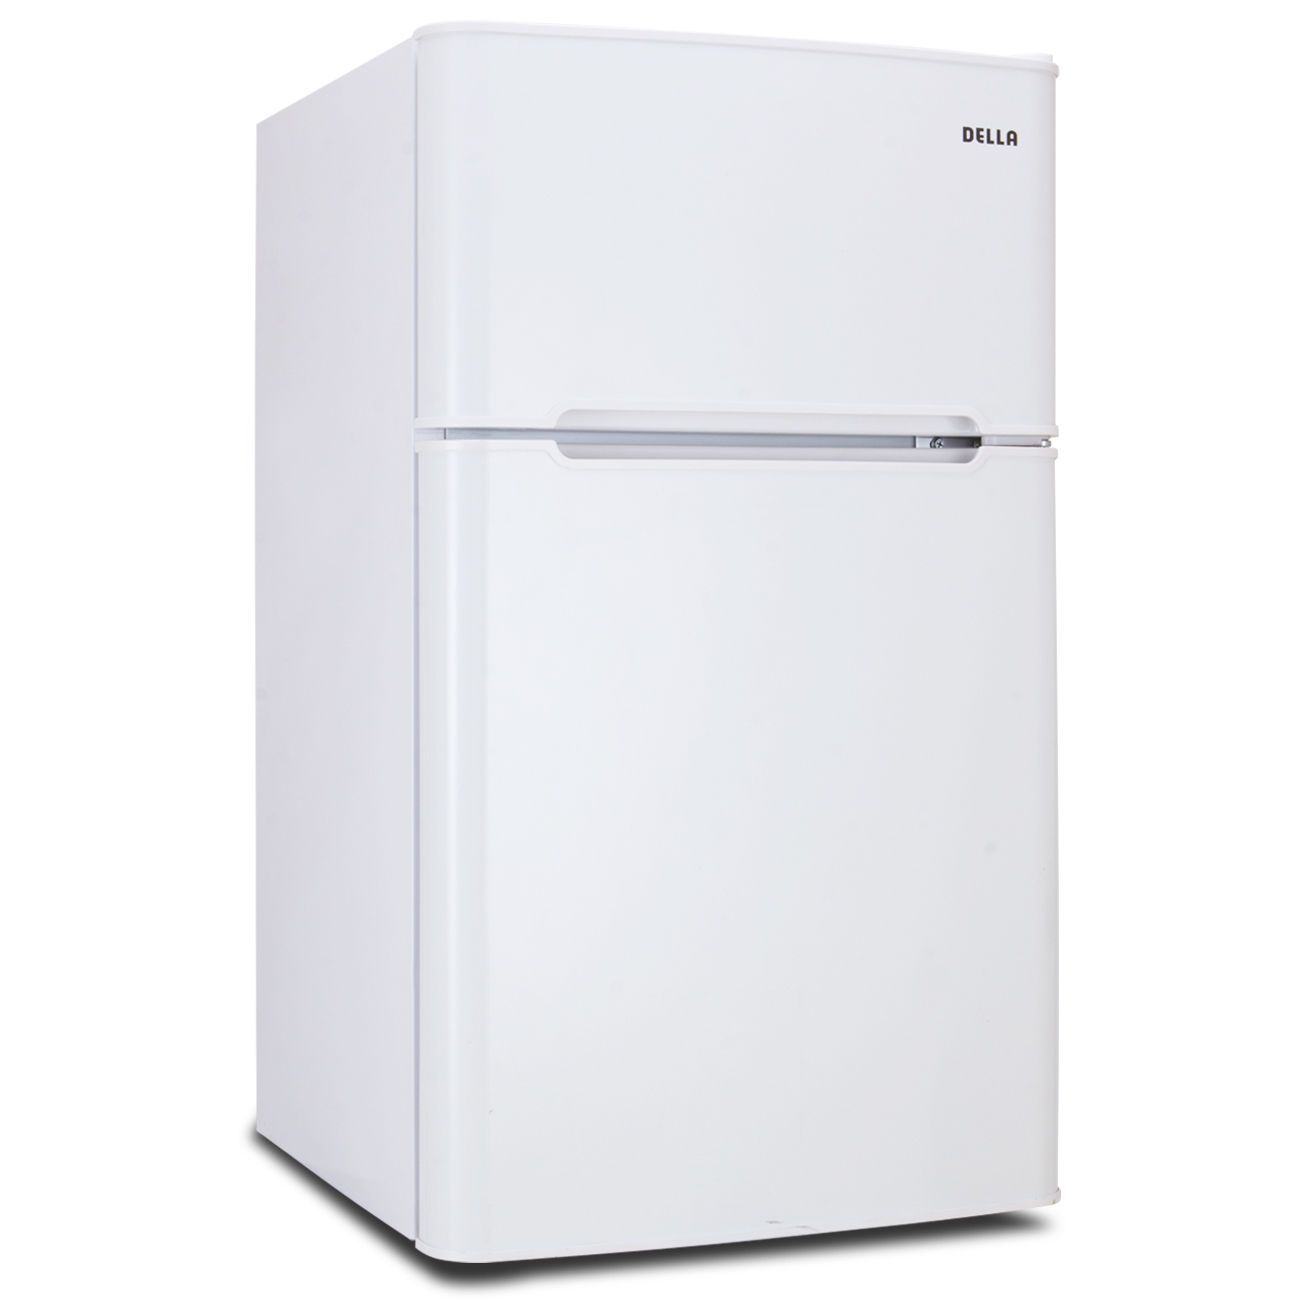 office mini refrigerator. 3.2 Cu Ft Mini Refrigerator And Freezer Small Compact Dorm Office Fridge White